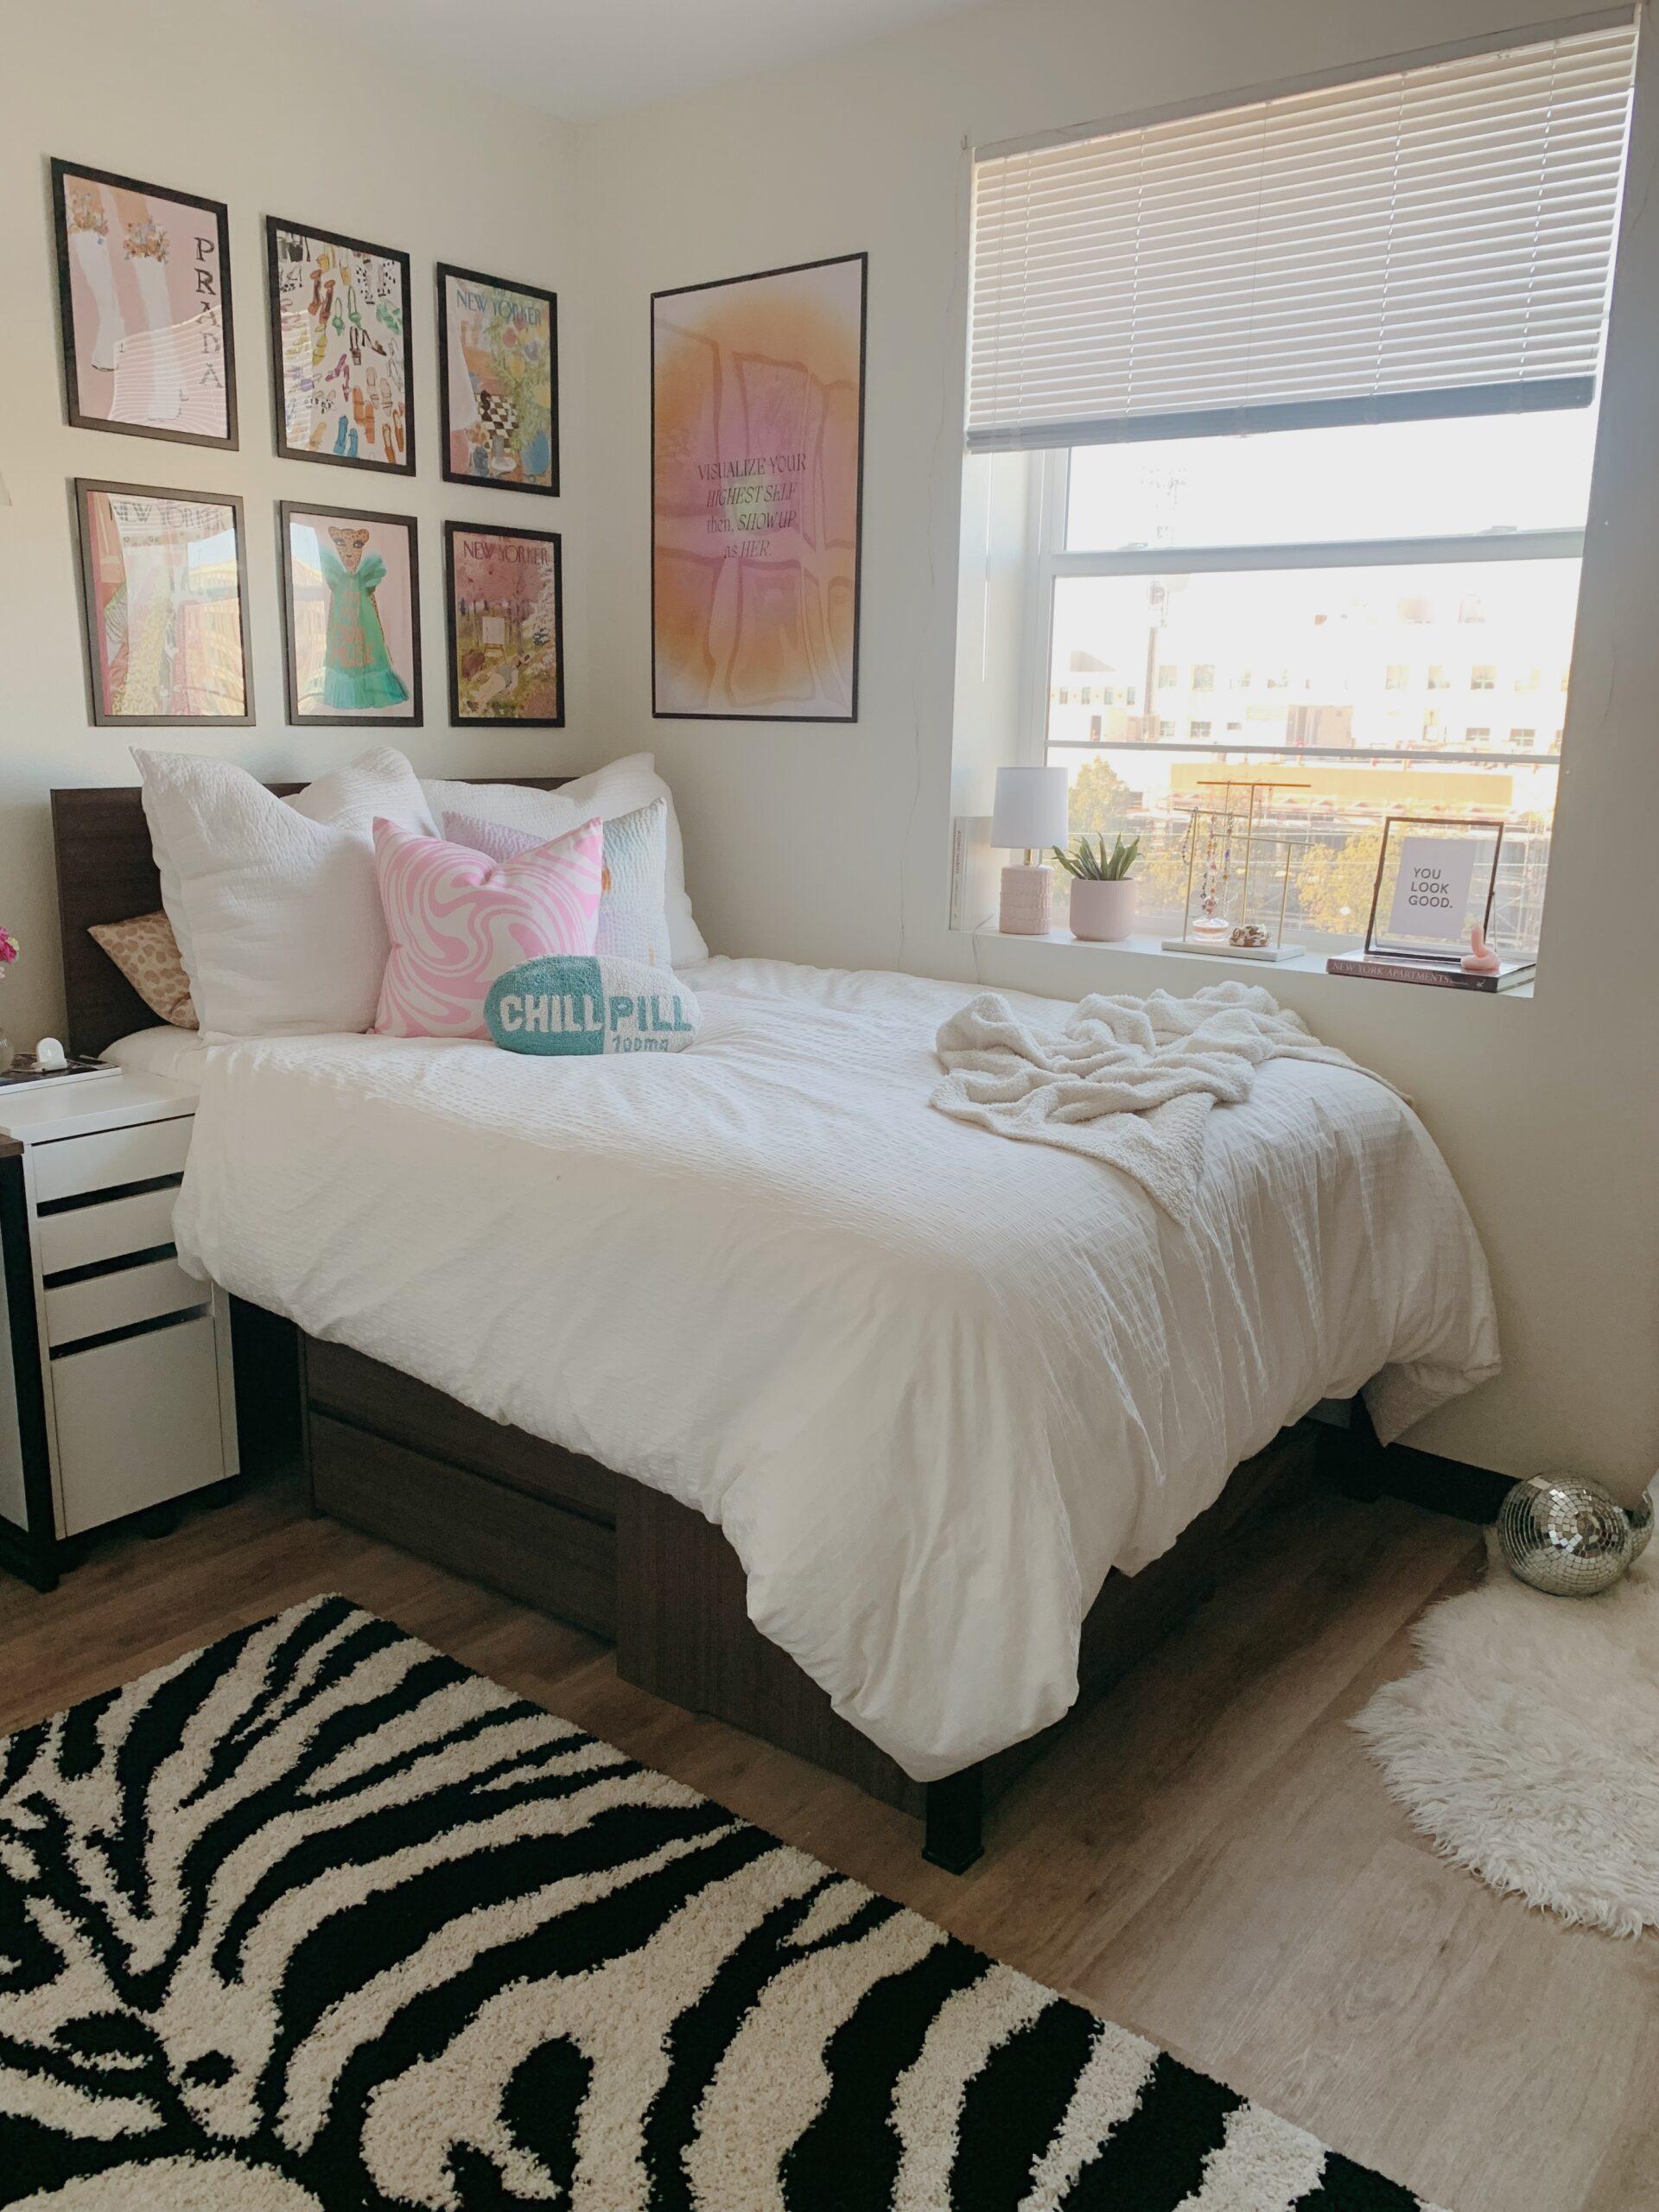 college bedroom essentials scaled